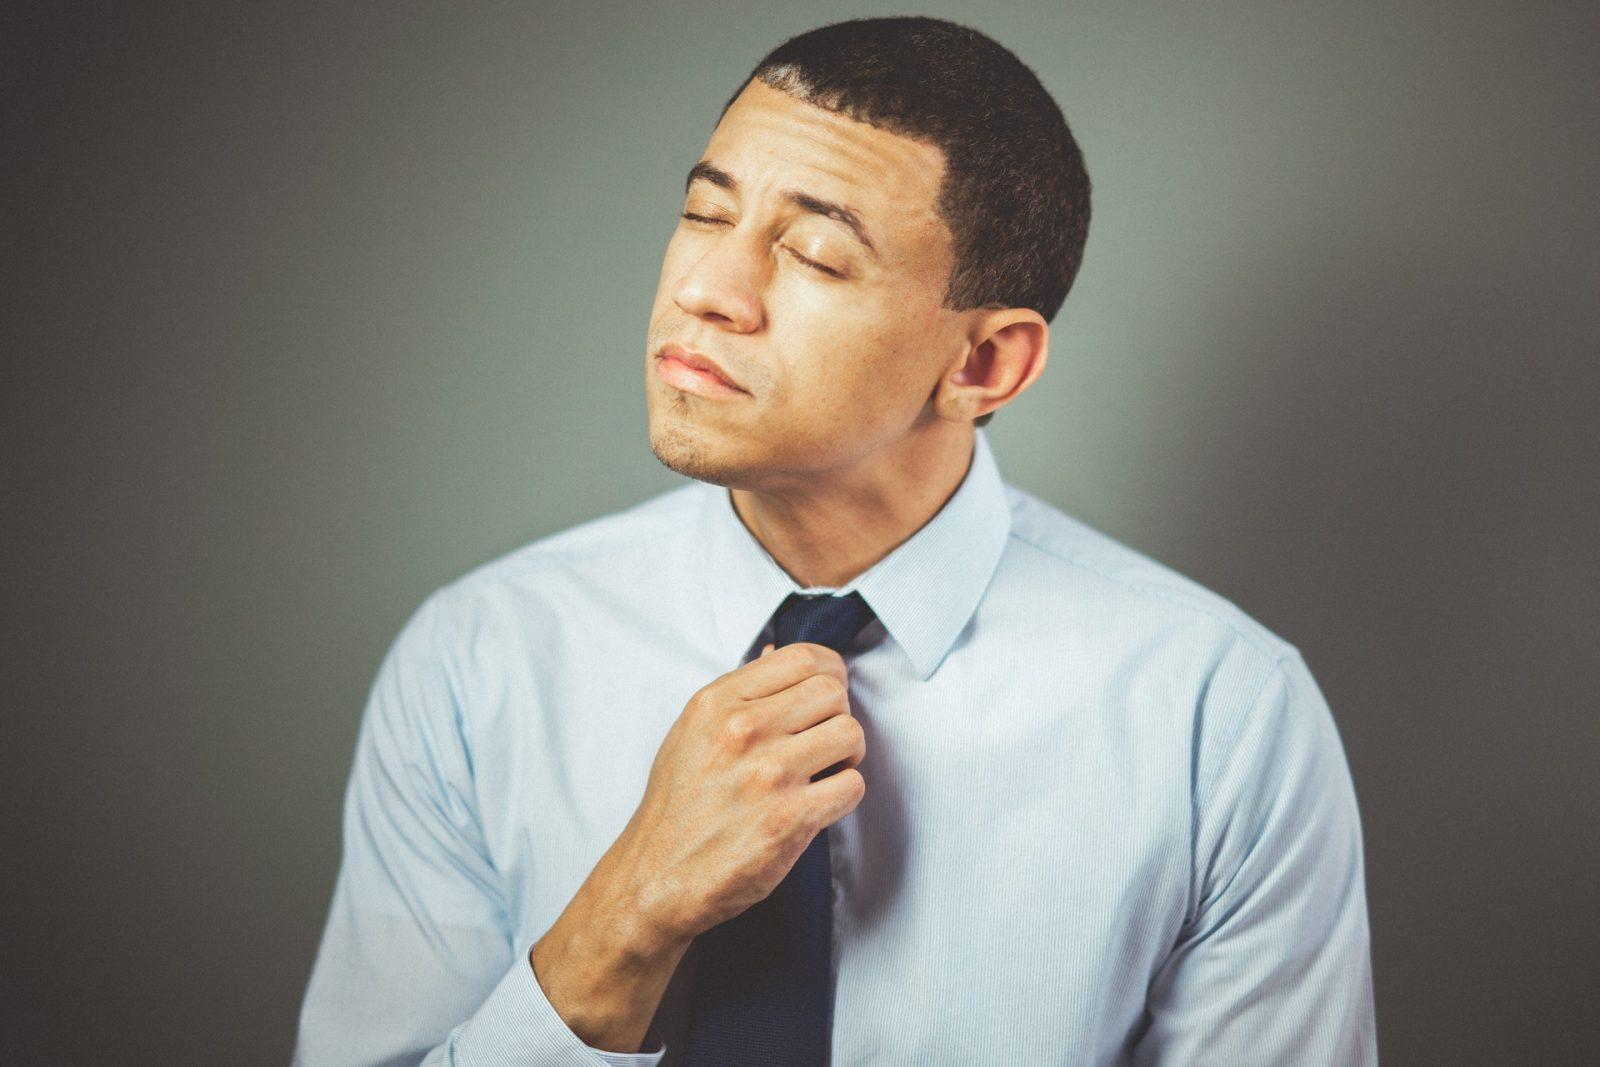 Panikattacke im Büro: Was kann ich selbst tun?